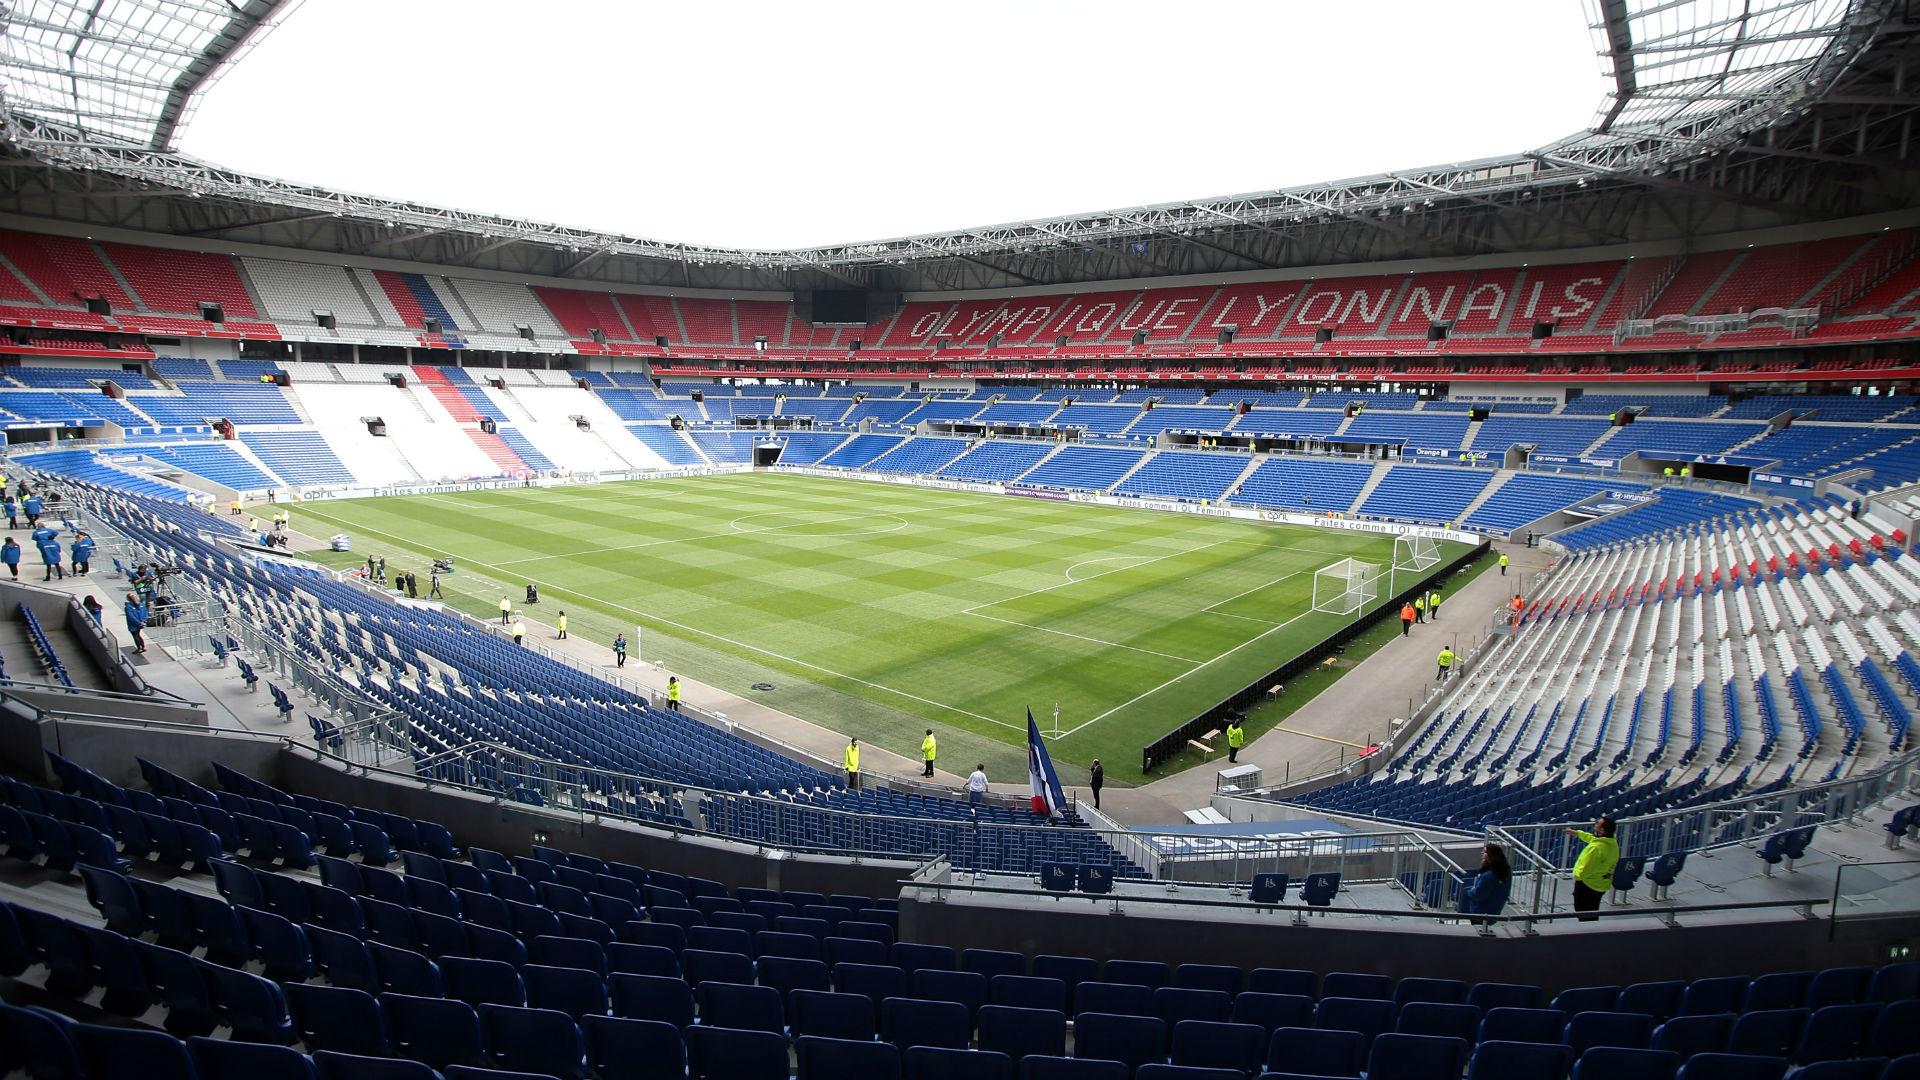 Groupama-Stadium-041819-usnews-getty-ftr